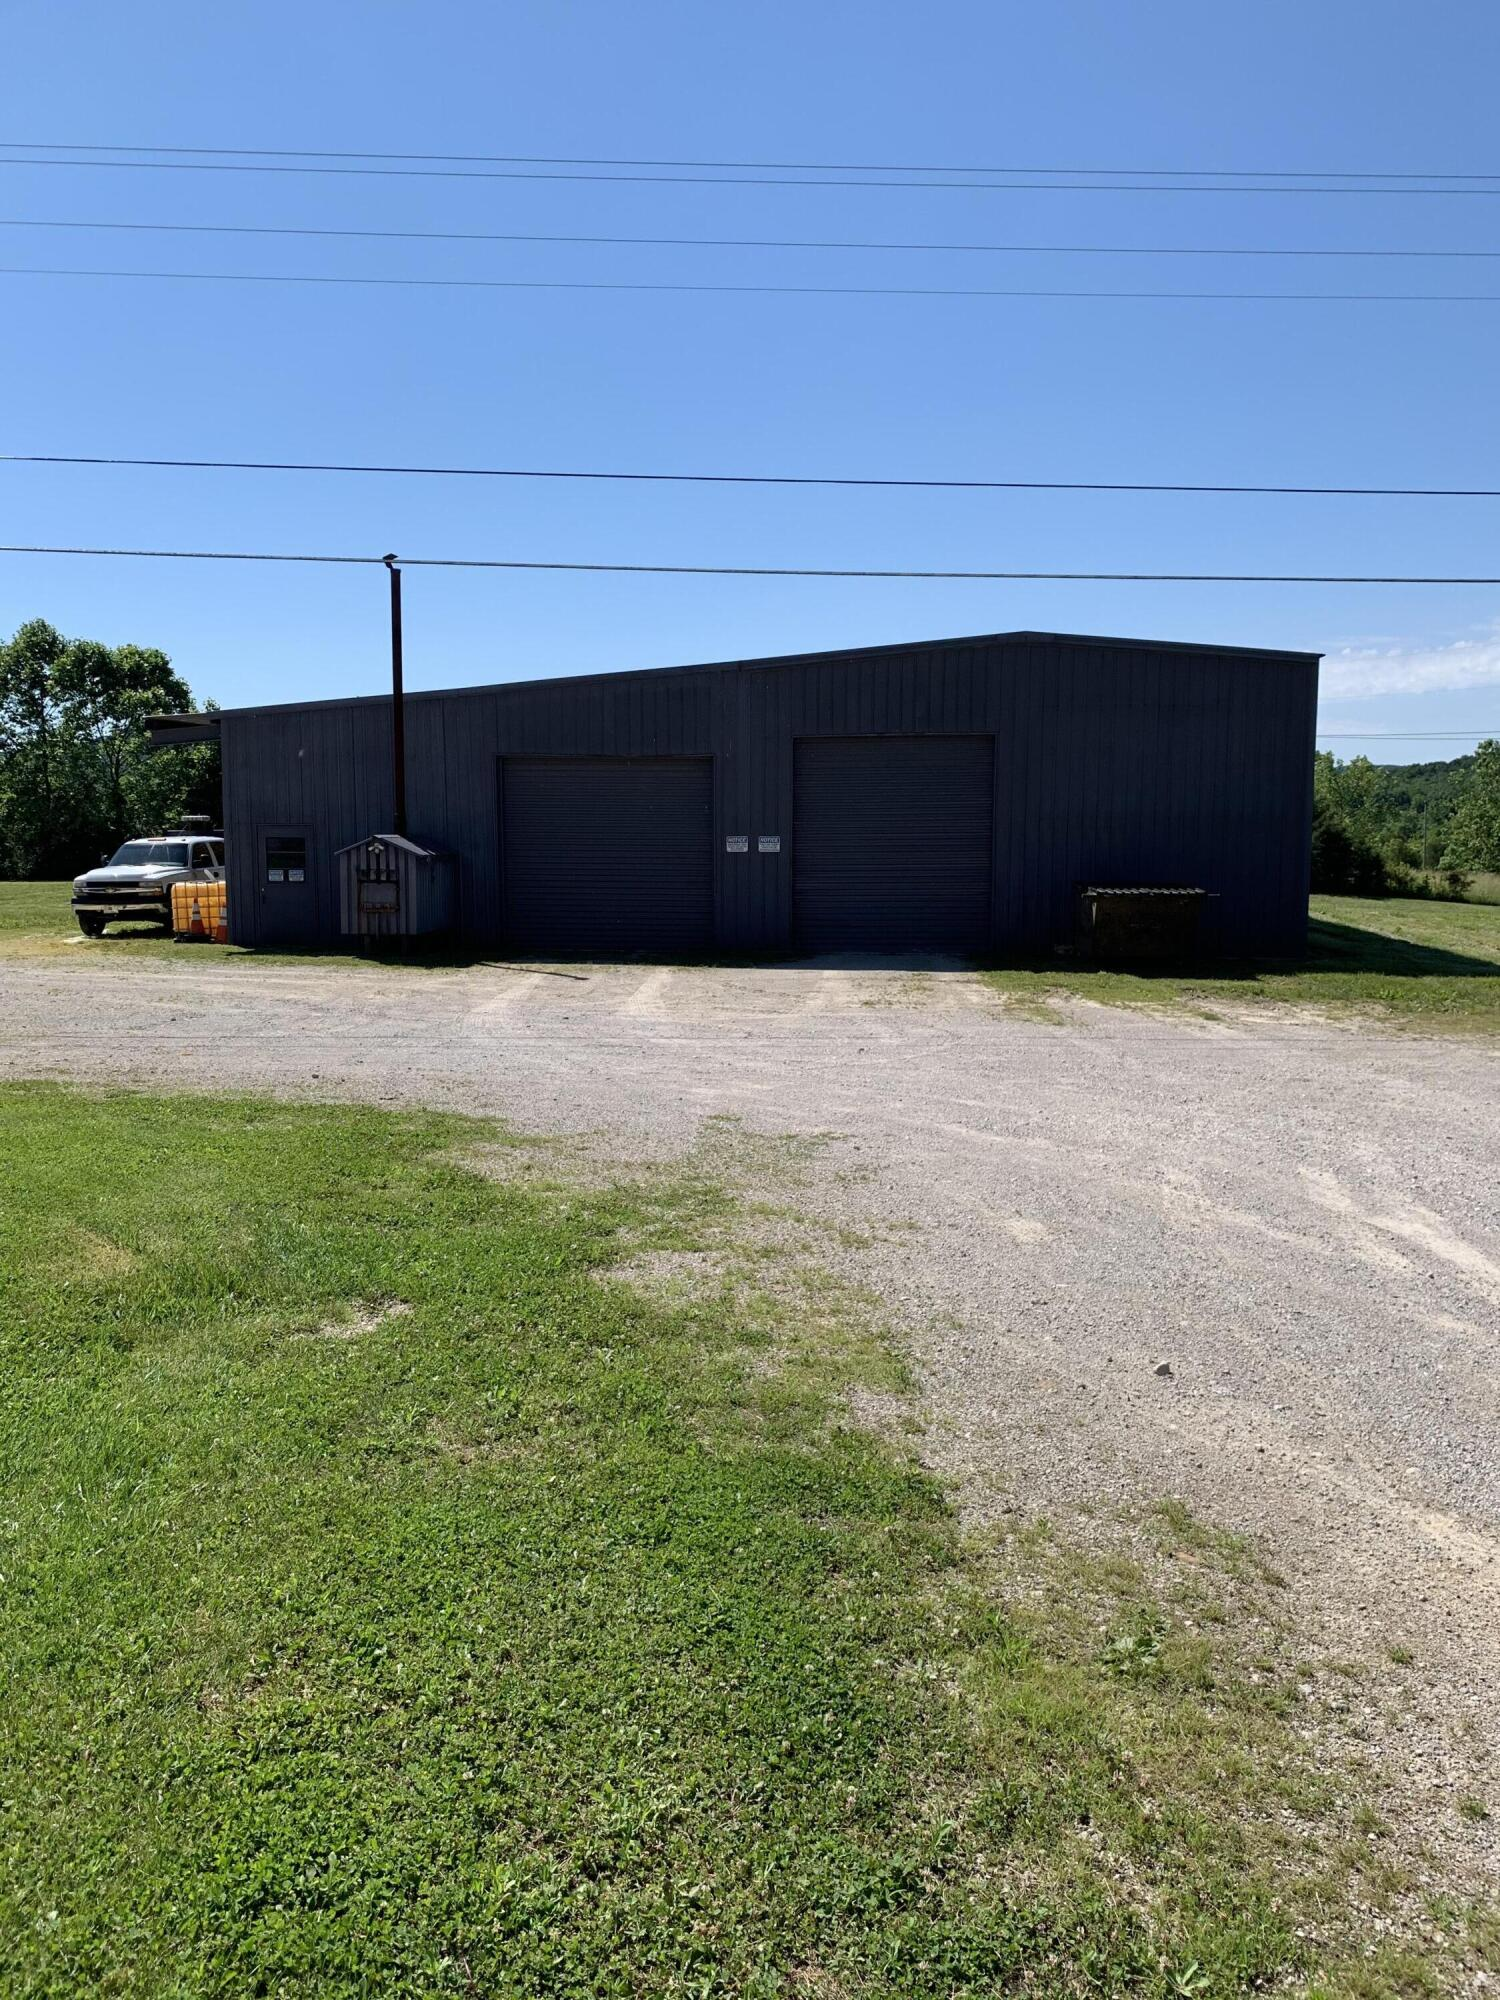 515 W KY 10, Tollesboro, KY 41189